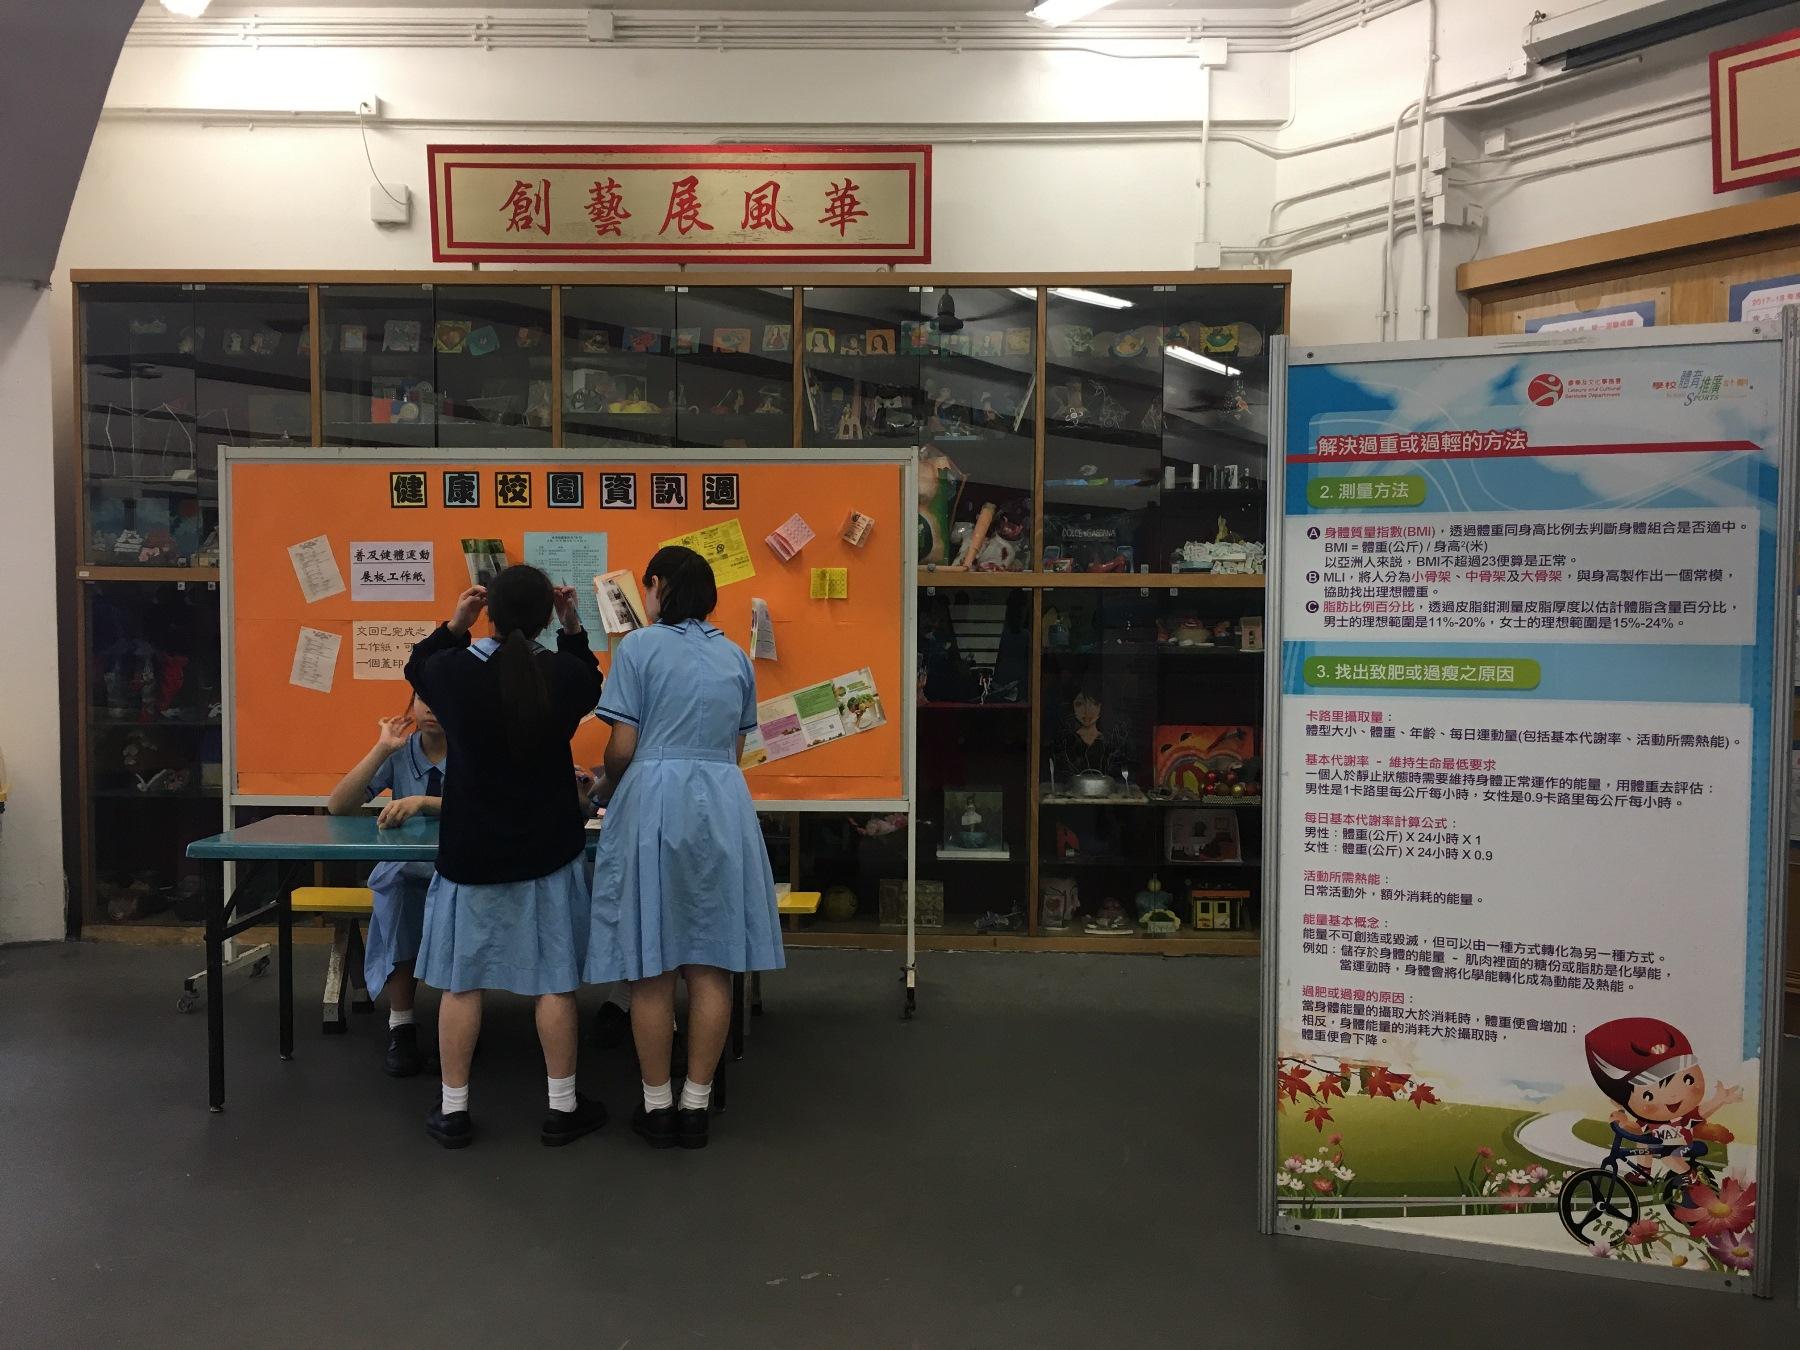 http://npc.edu.hk/sites/default/files/img_5364.jpg